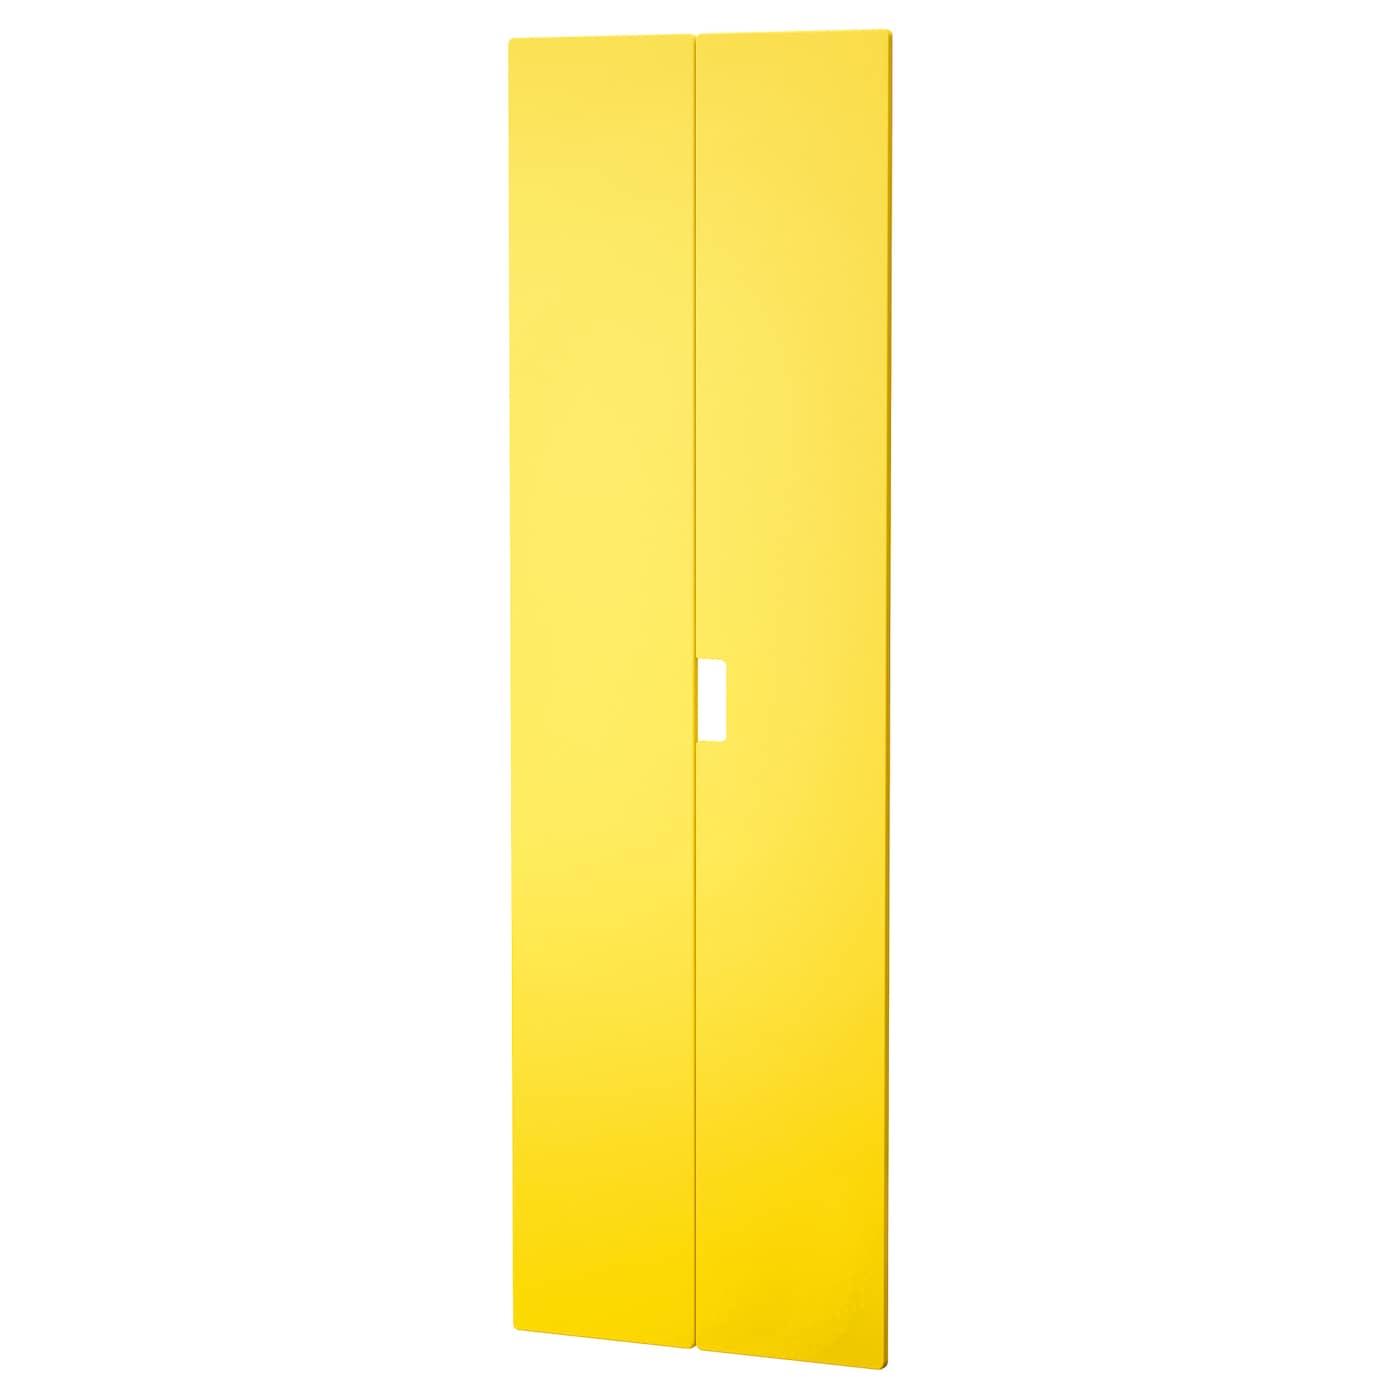 stuva m lad porte jaune 60x192 cm ikea. Black Bedroom Furniture Sets. Home Design Ideas